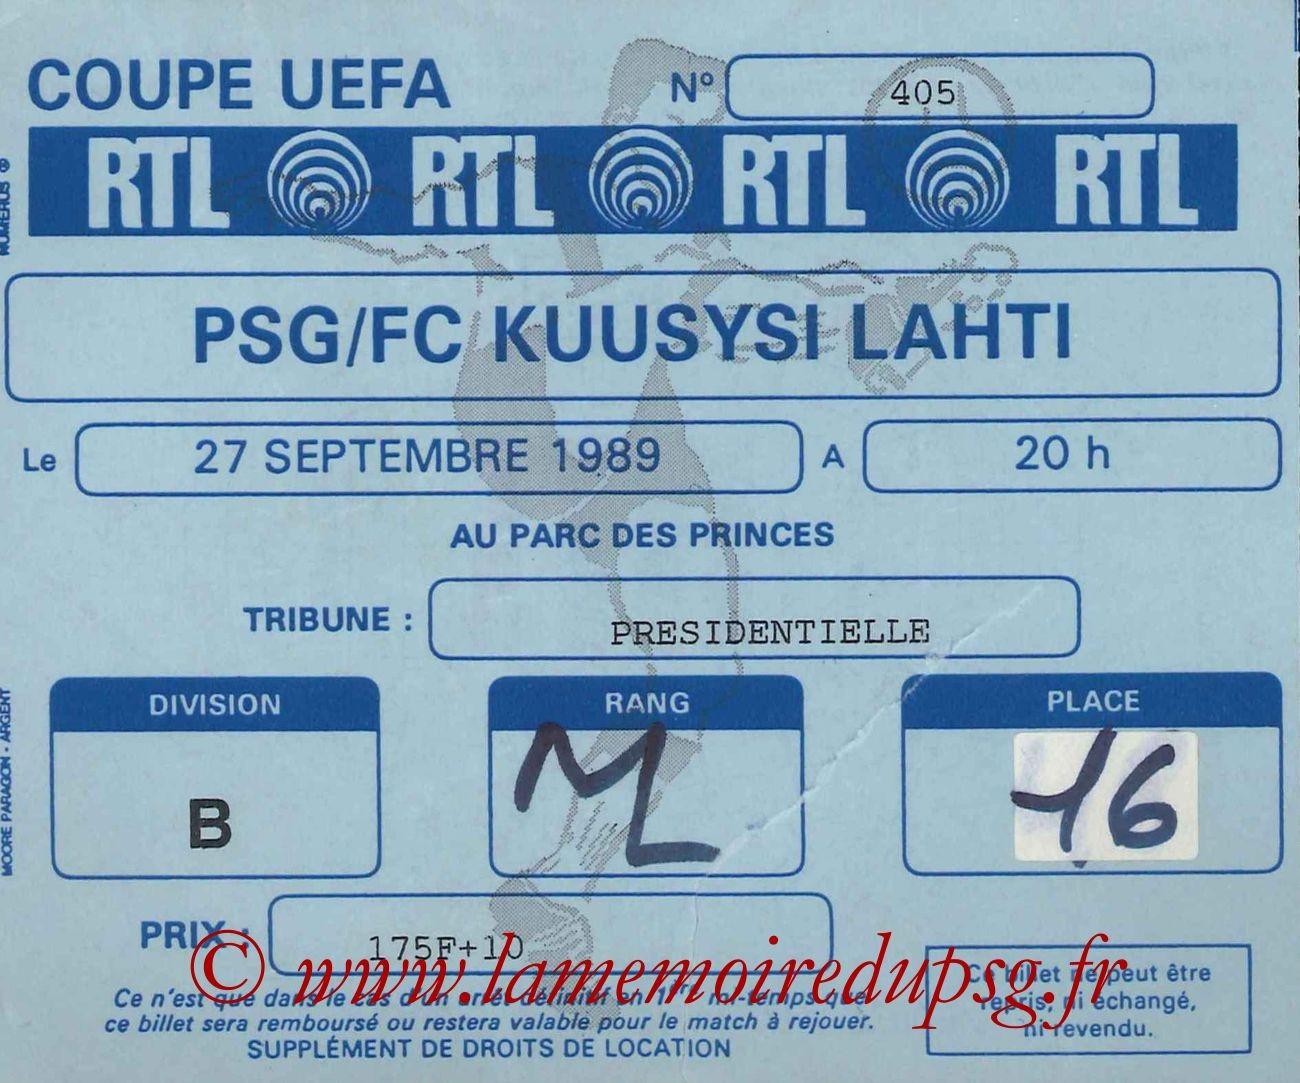 1989-09-27  PSG-Kuusysi Lahti (32ème Retour C3, bis)